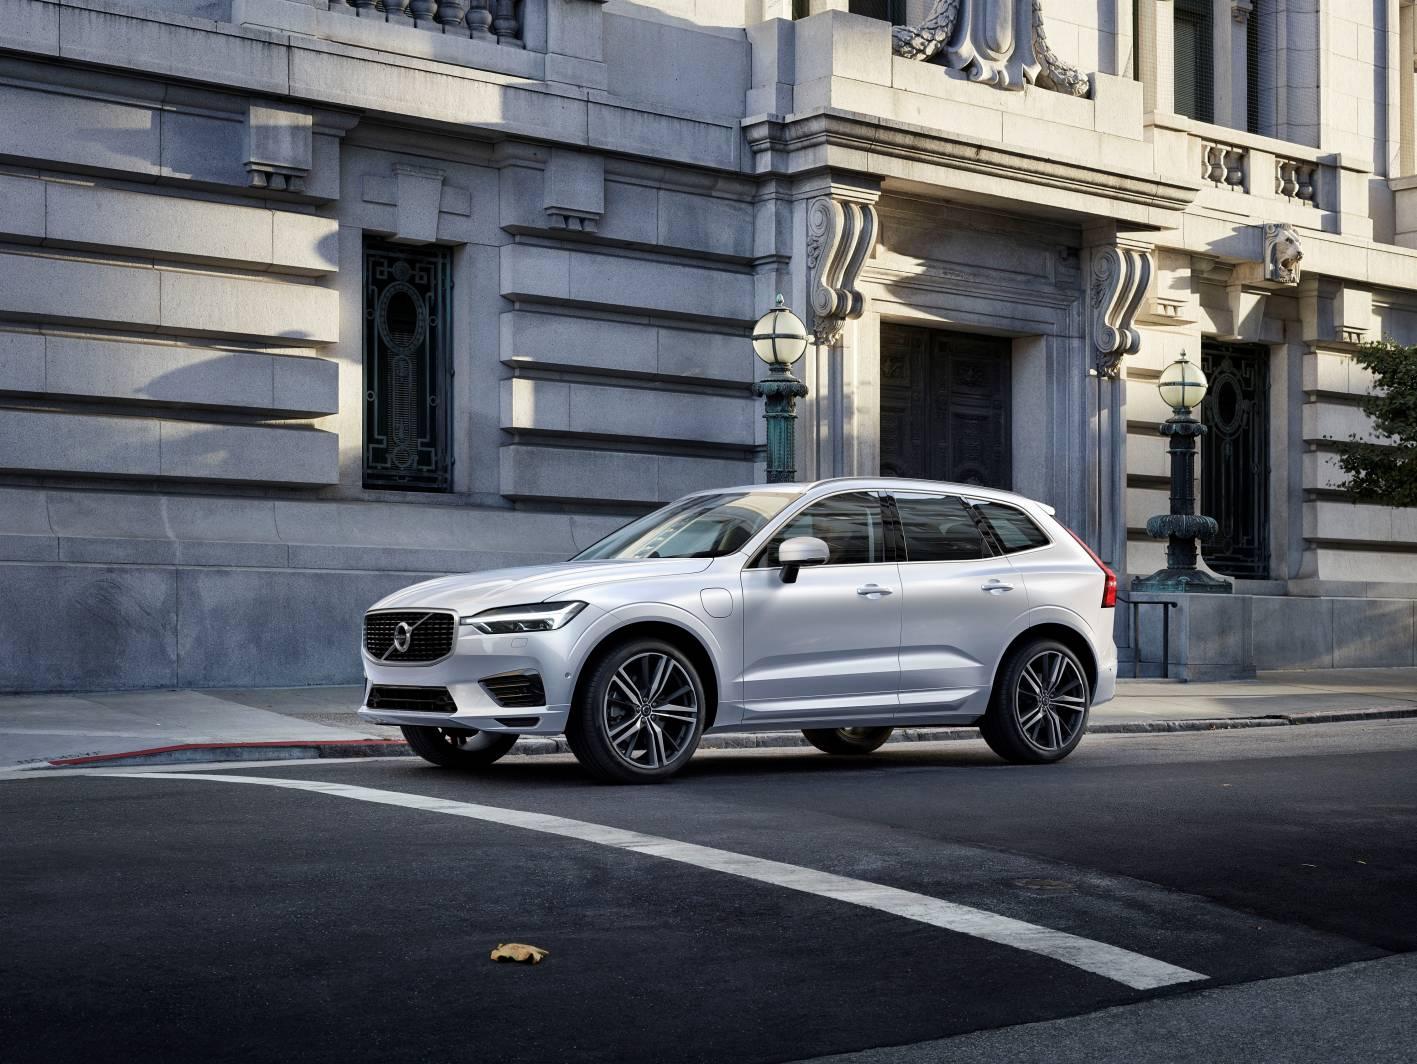 Volvo's new XC60 SUV - 2